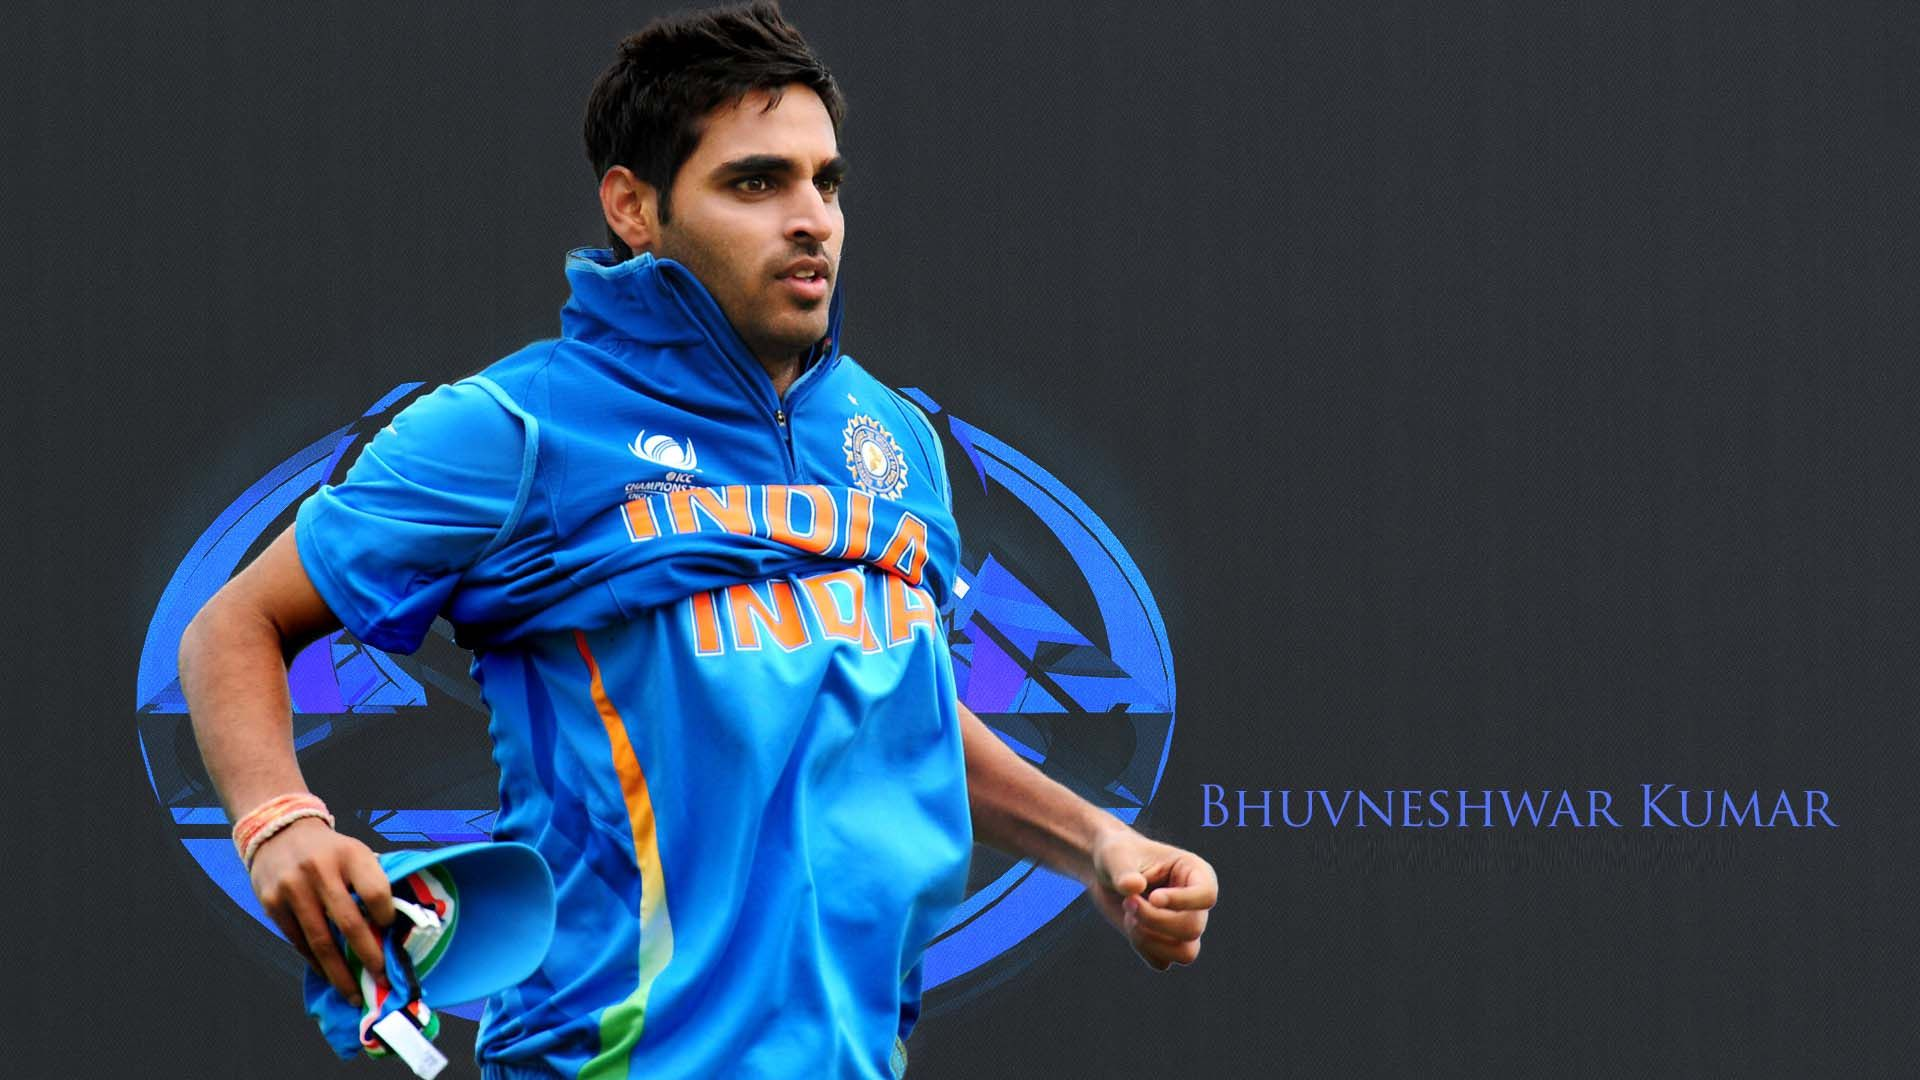 bhuvneshwar kumar indian cricketer hd wallpaper indian cricketer